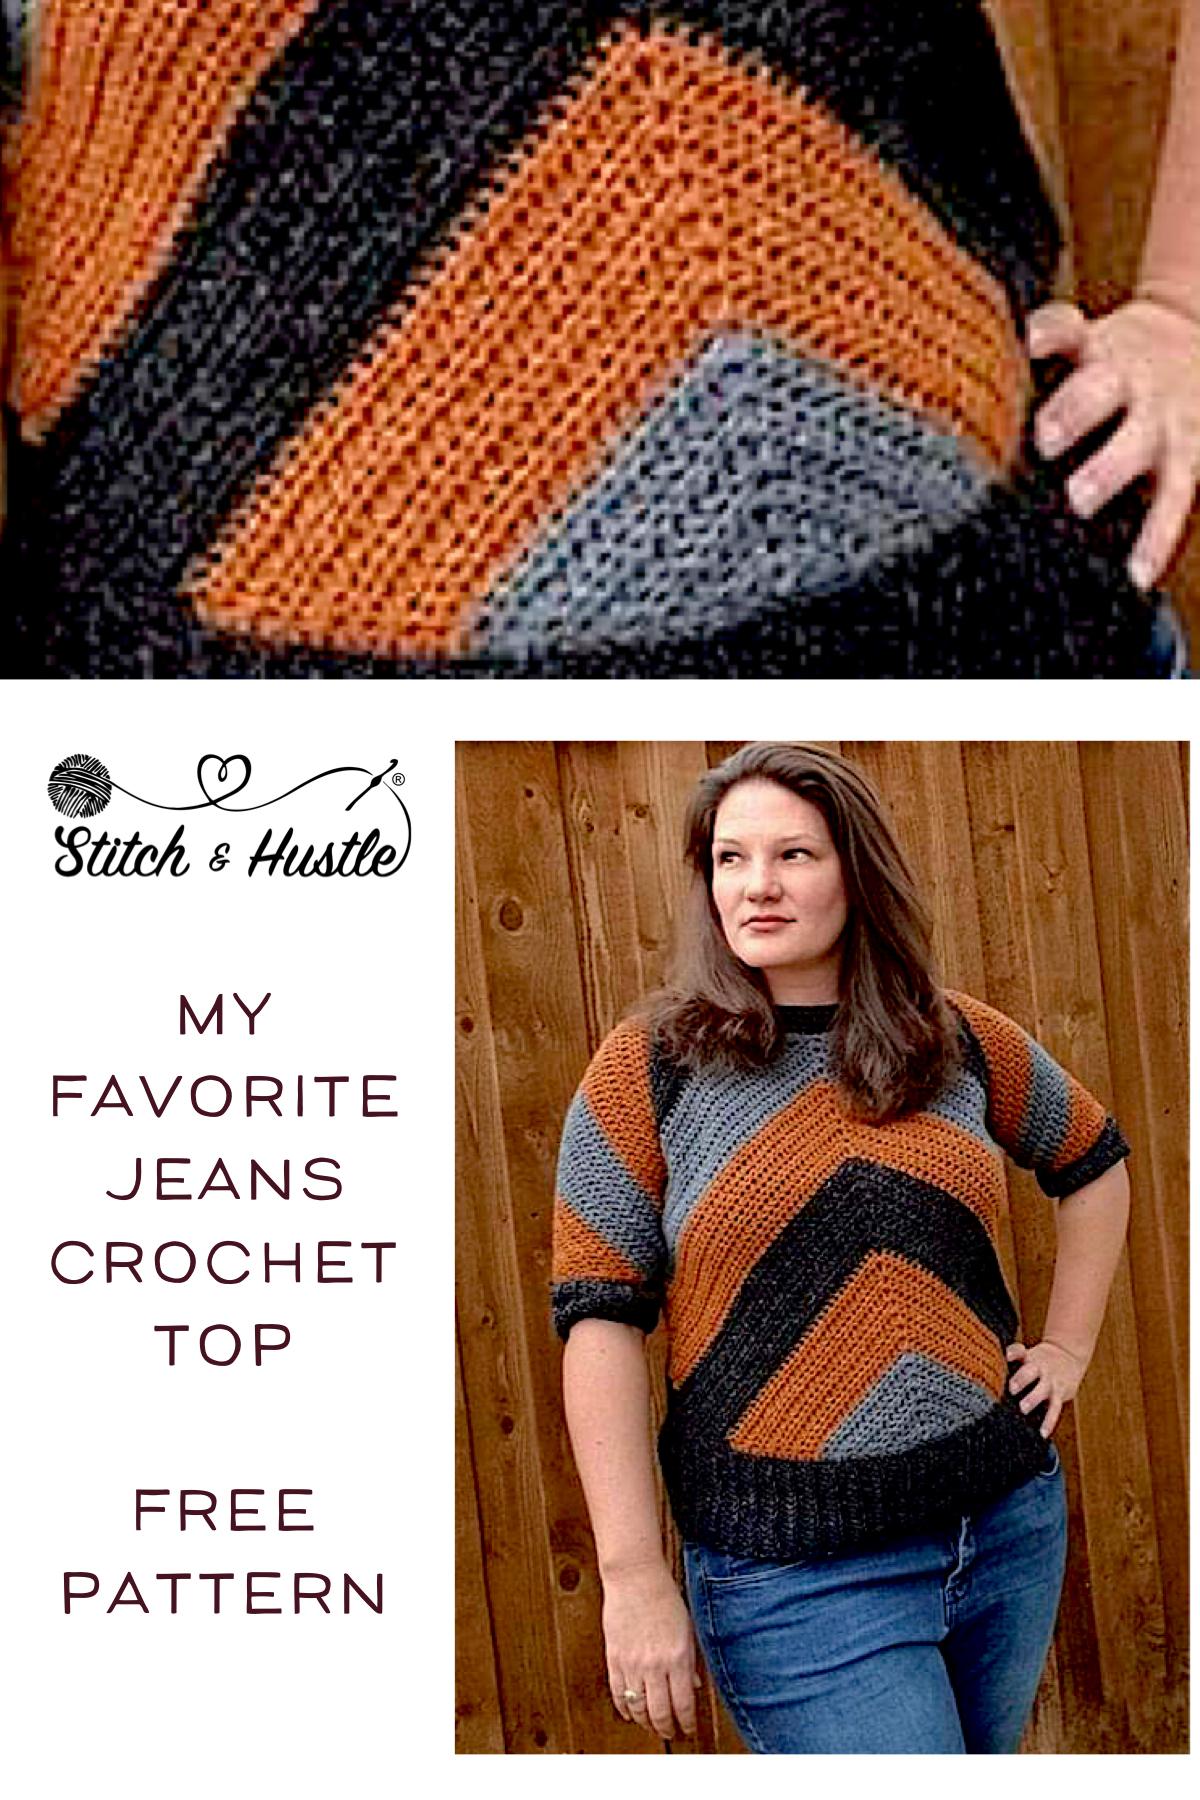 MyFavorite_Jeans_Top_Free_Crochet_Top_Pattern_3.jpg